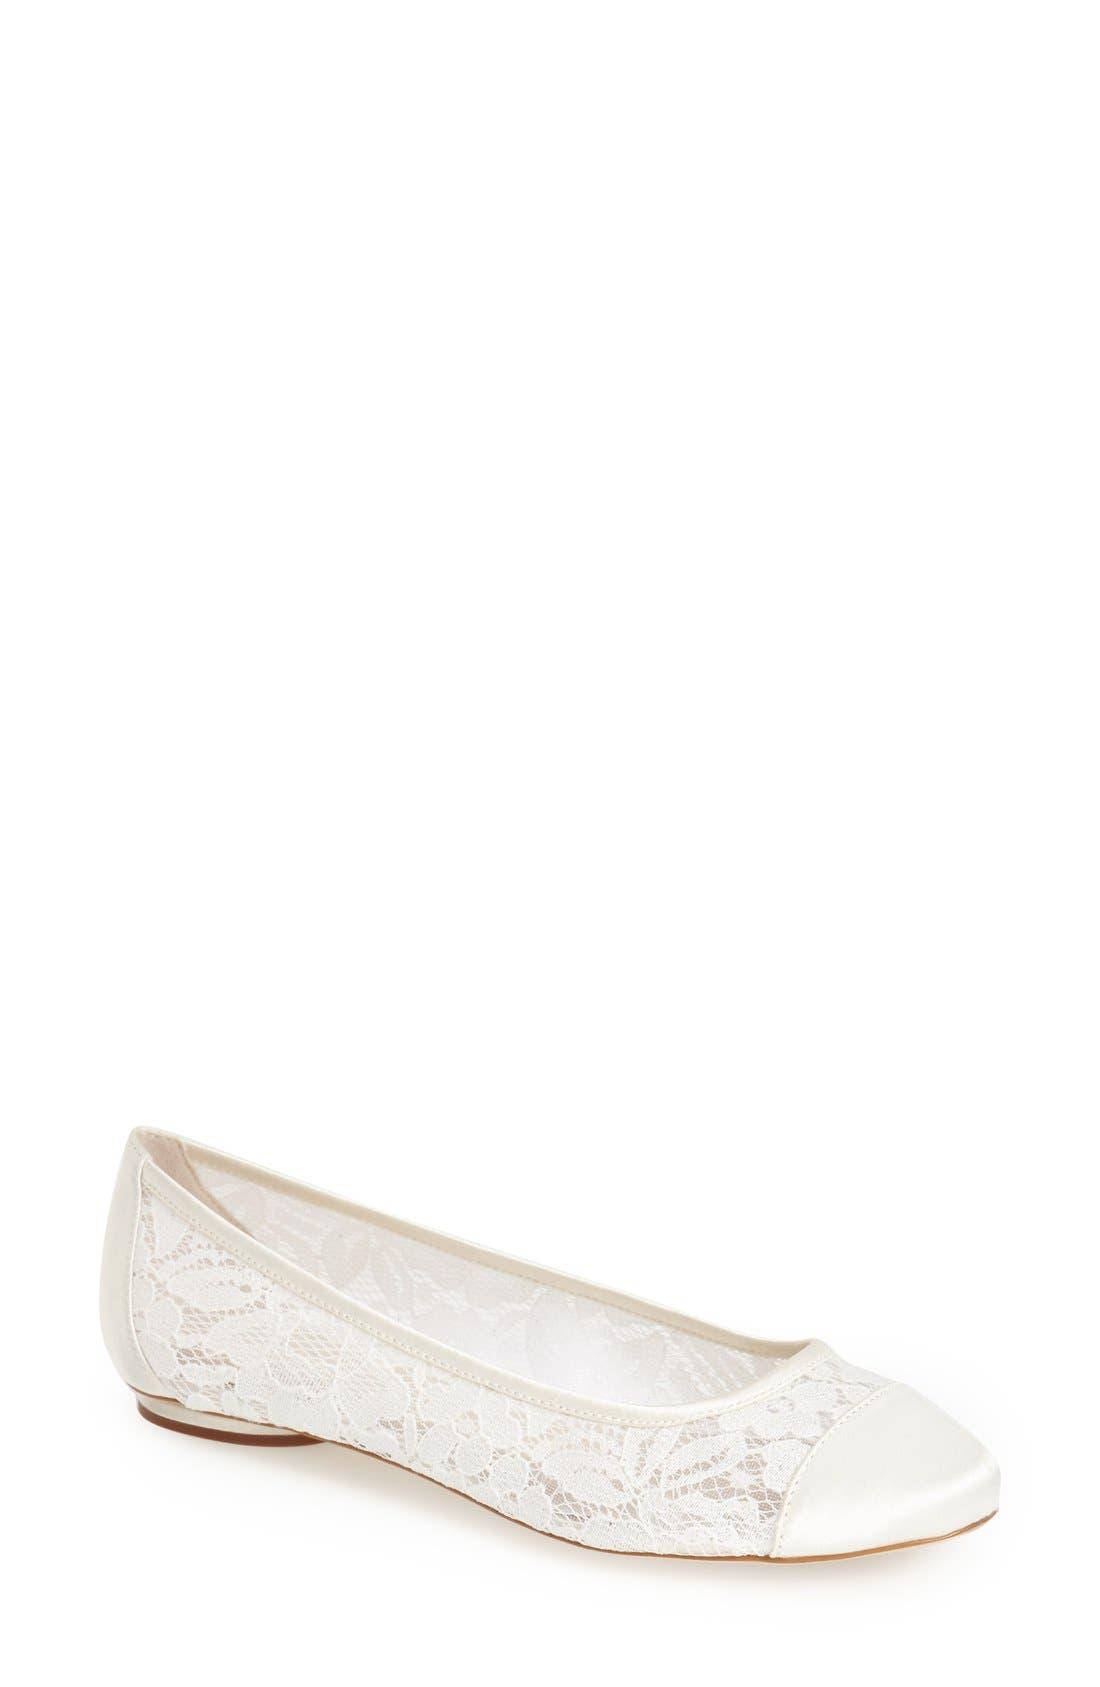 Main Image - pink paradox london 'Sweetie' Lace Cap Toe Ballet Flat (Women)